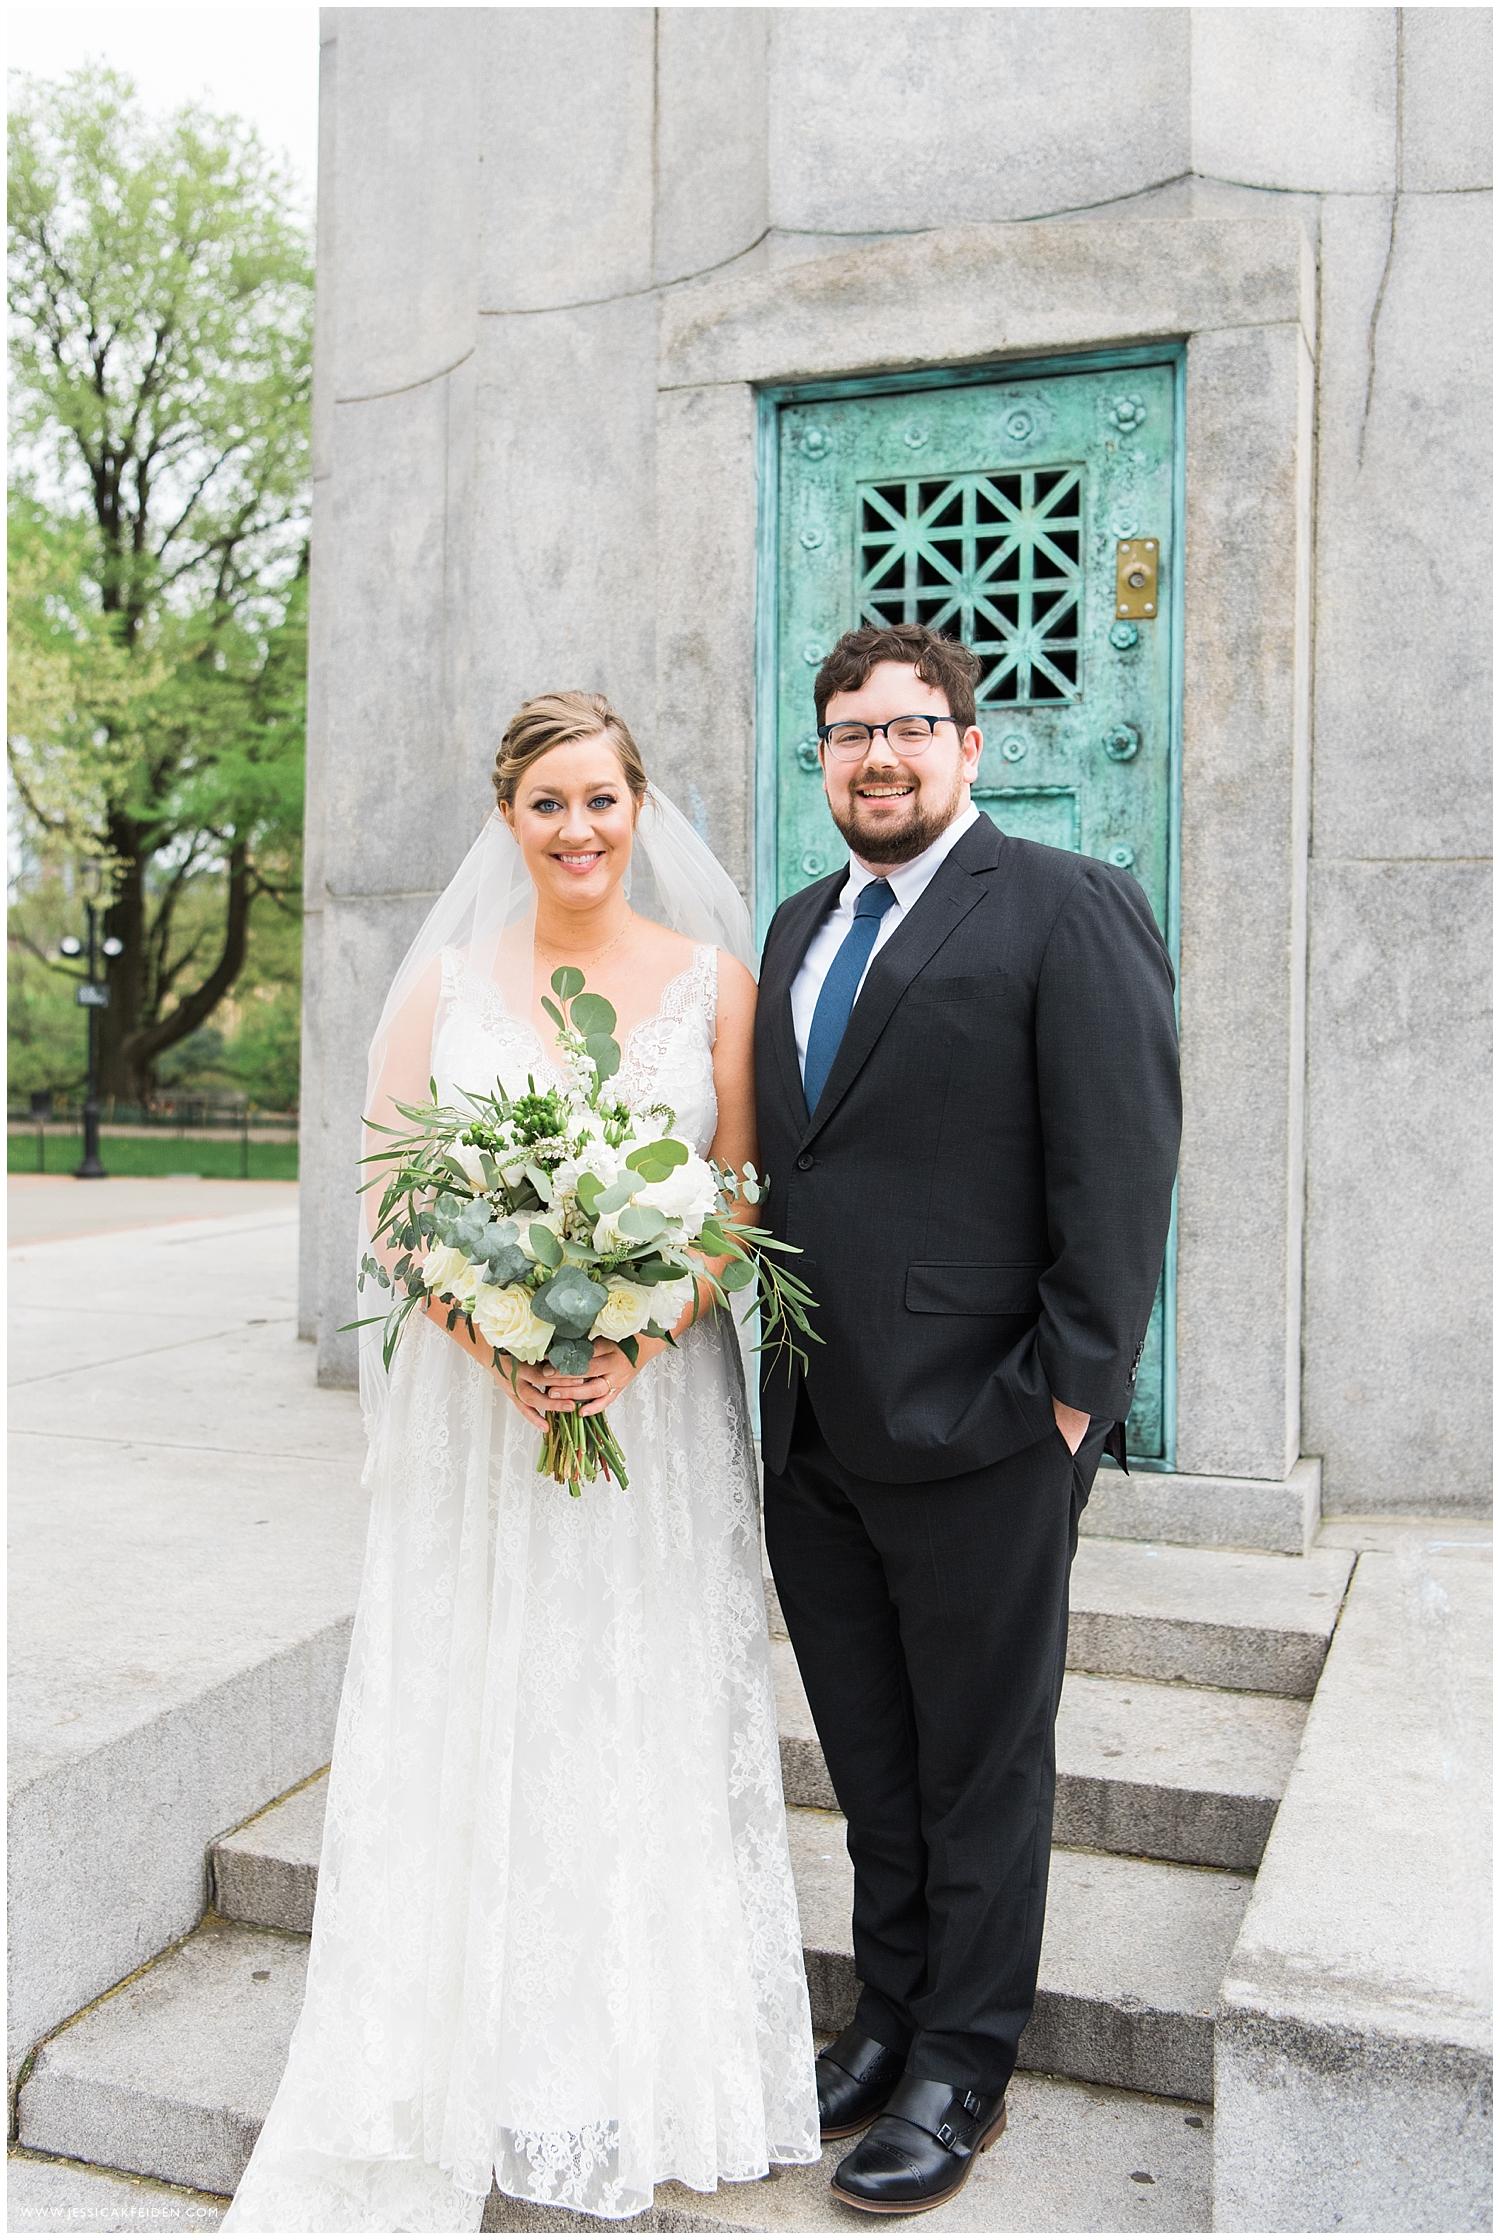 Jessica K Feiden Photography_Margaux+Tim's Irondale Center Brooklyn Wedding_0024.jpg